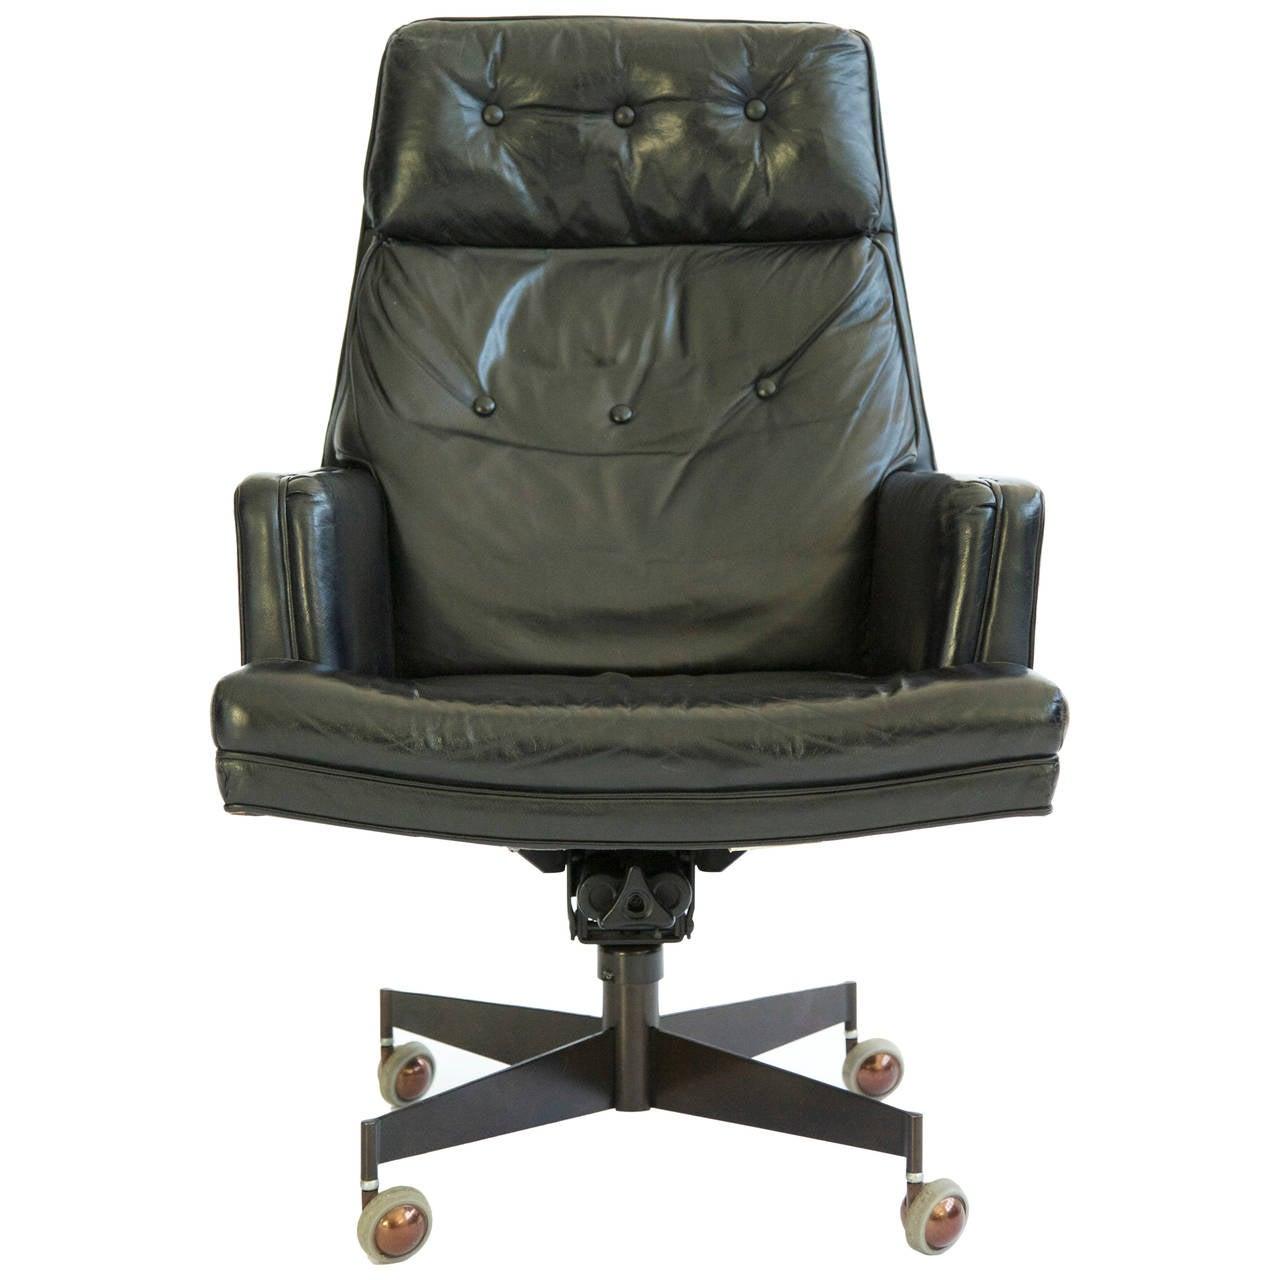 Edward wormley executive swivel chair at 1stdibs - Edward wormley chairs ...